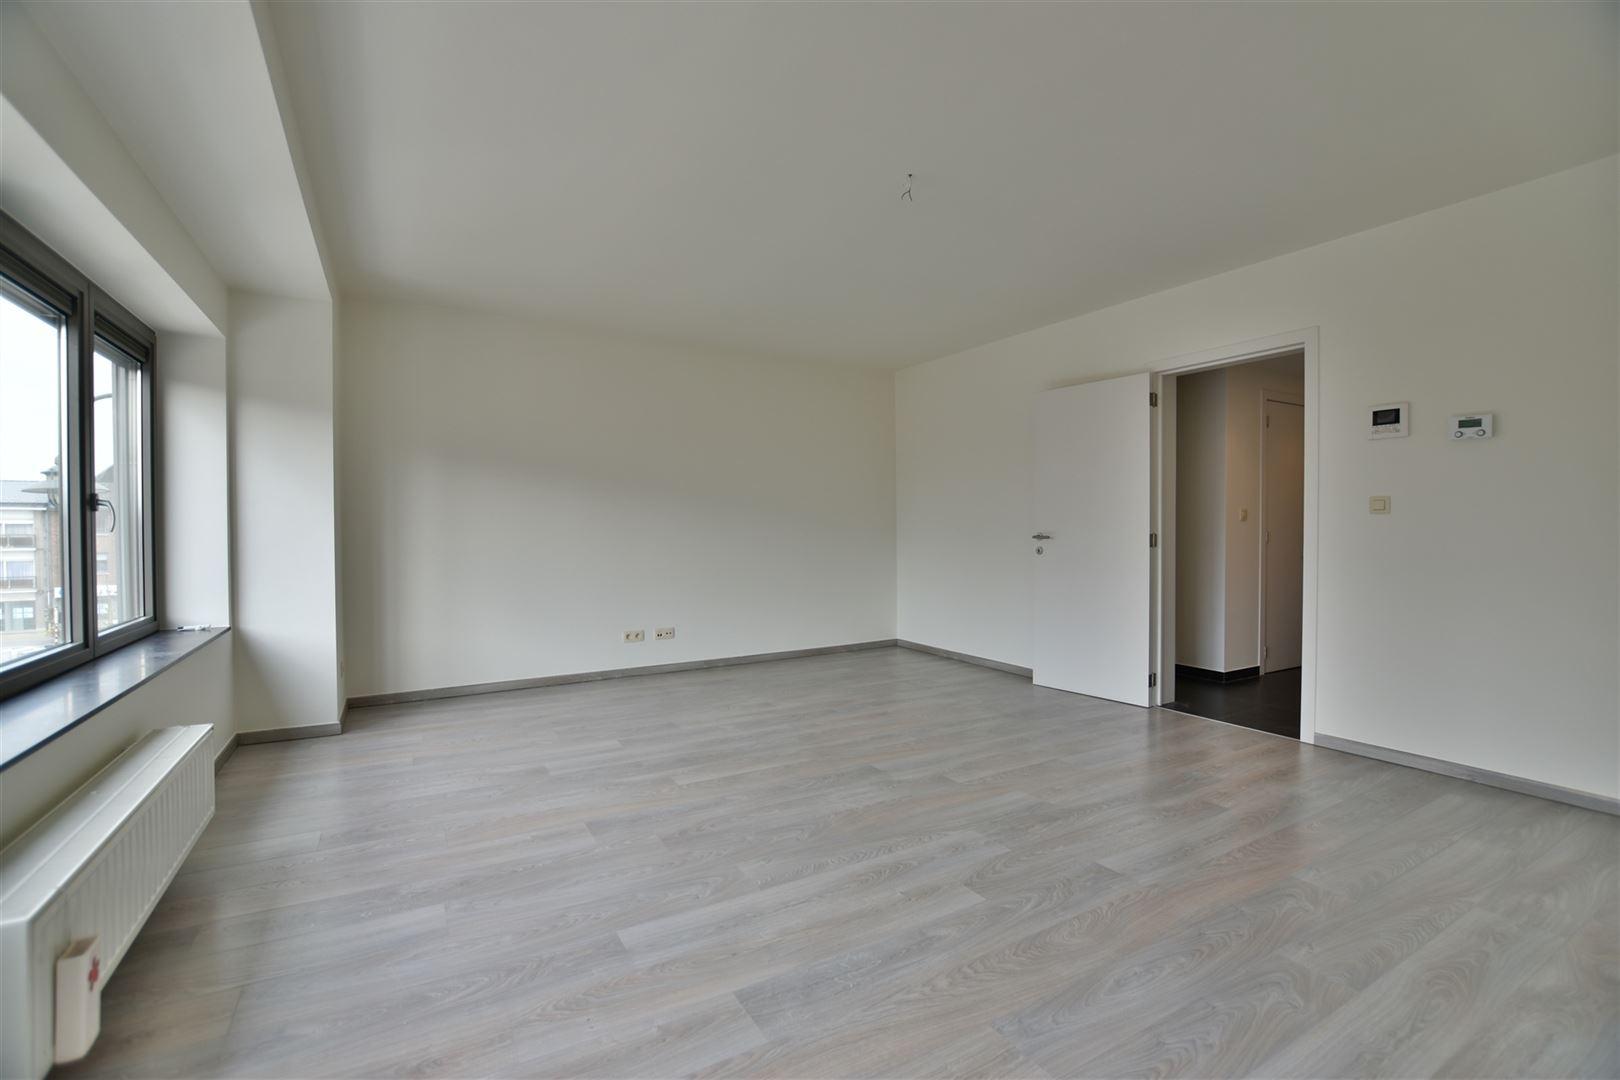 Foto 1 : Duplex/Penthouse te 9200 Sint-Gillis-bij-Dendermonde (België) - Prijs € 278.000